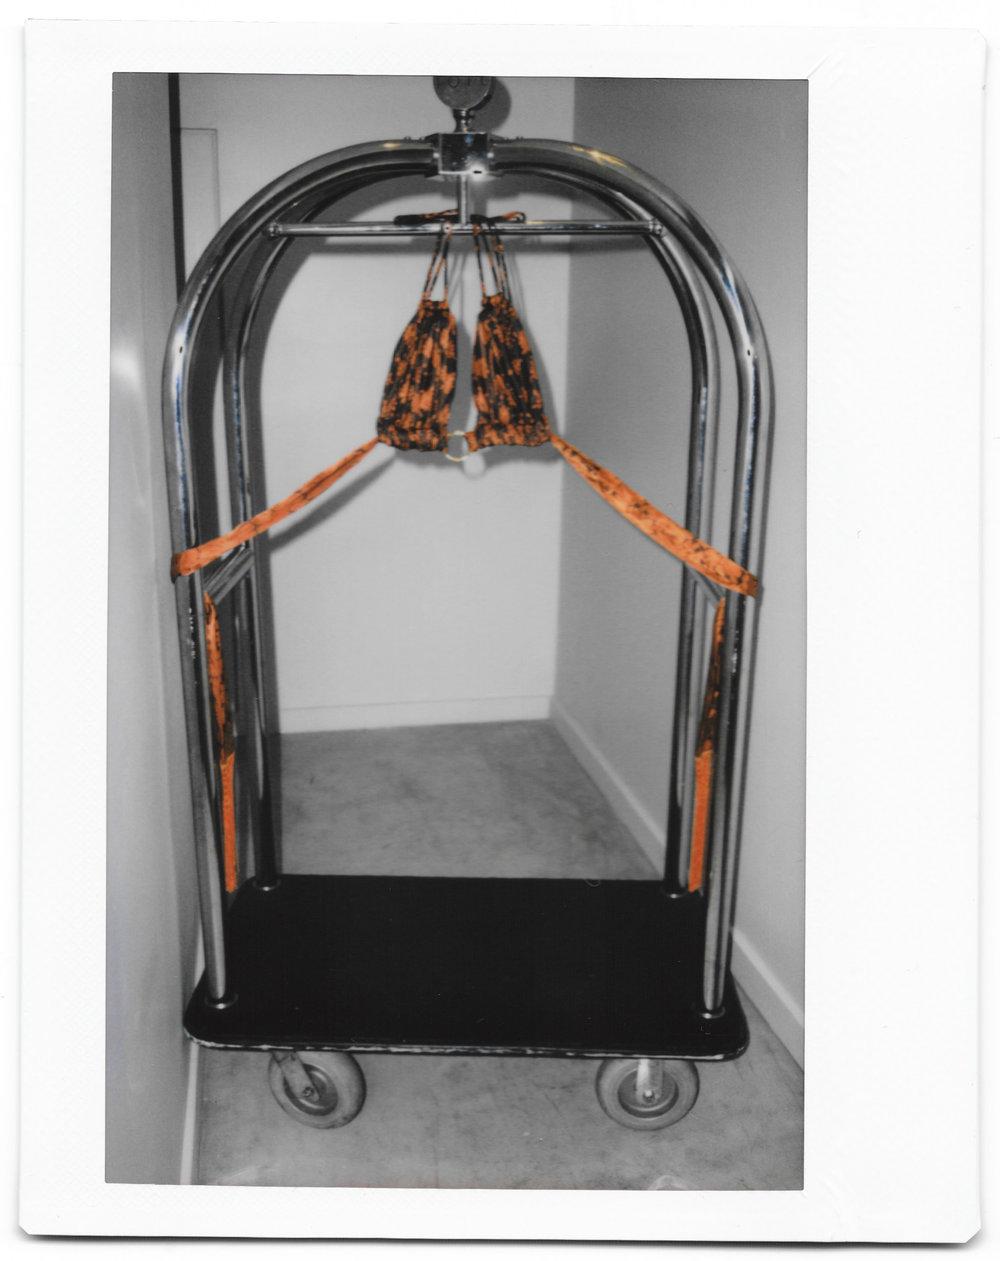 hotel cart 6.jpg